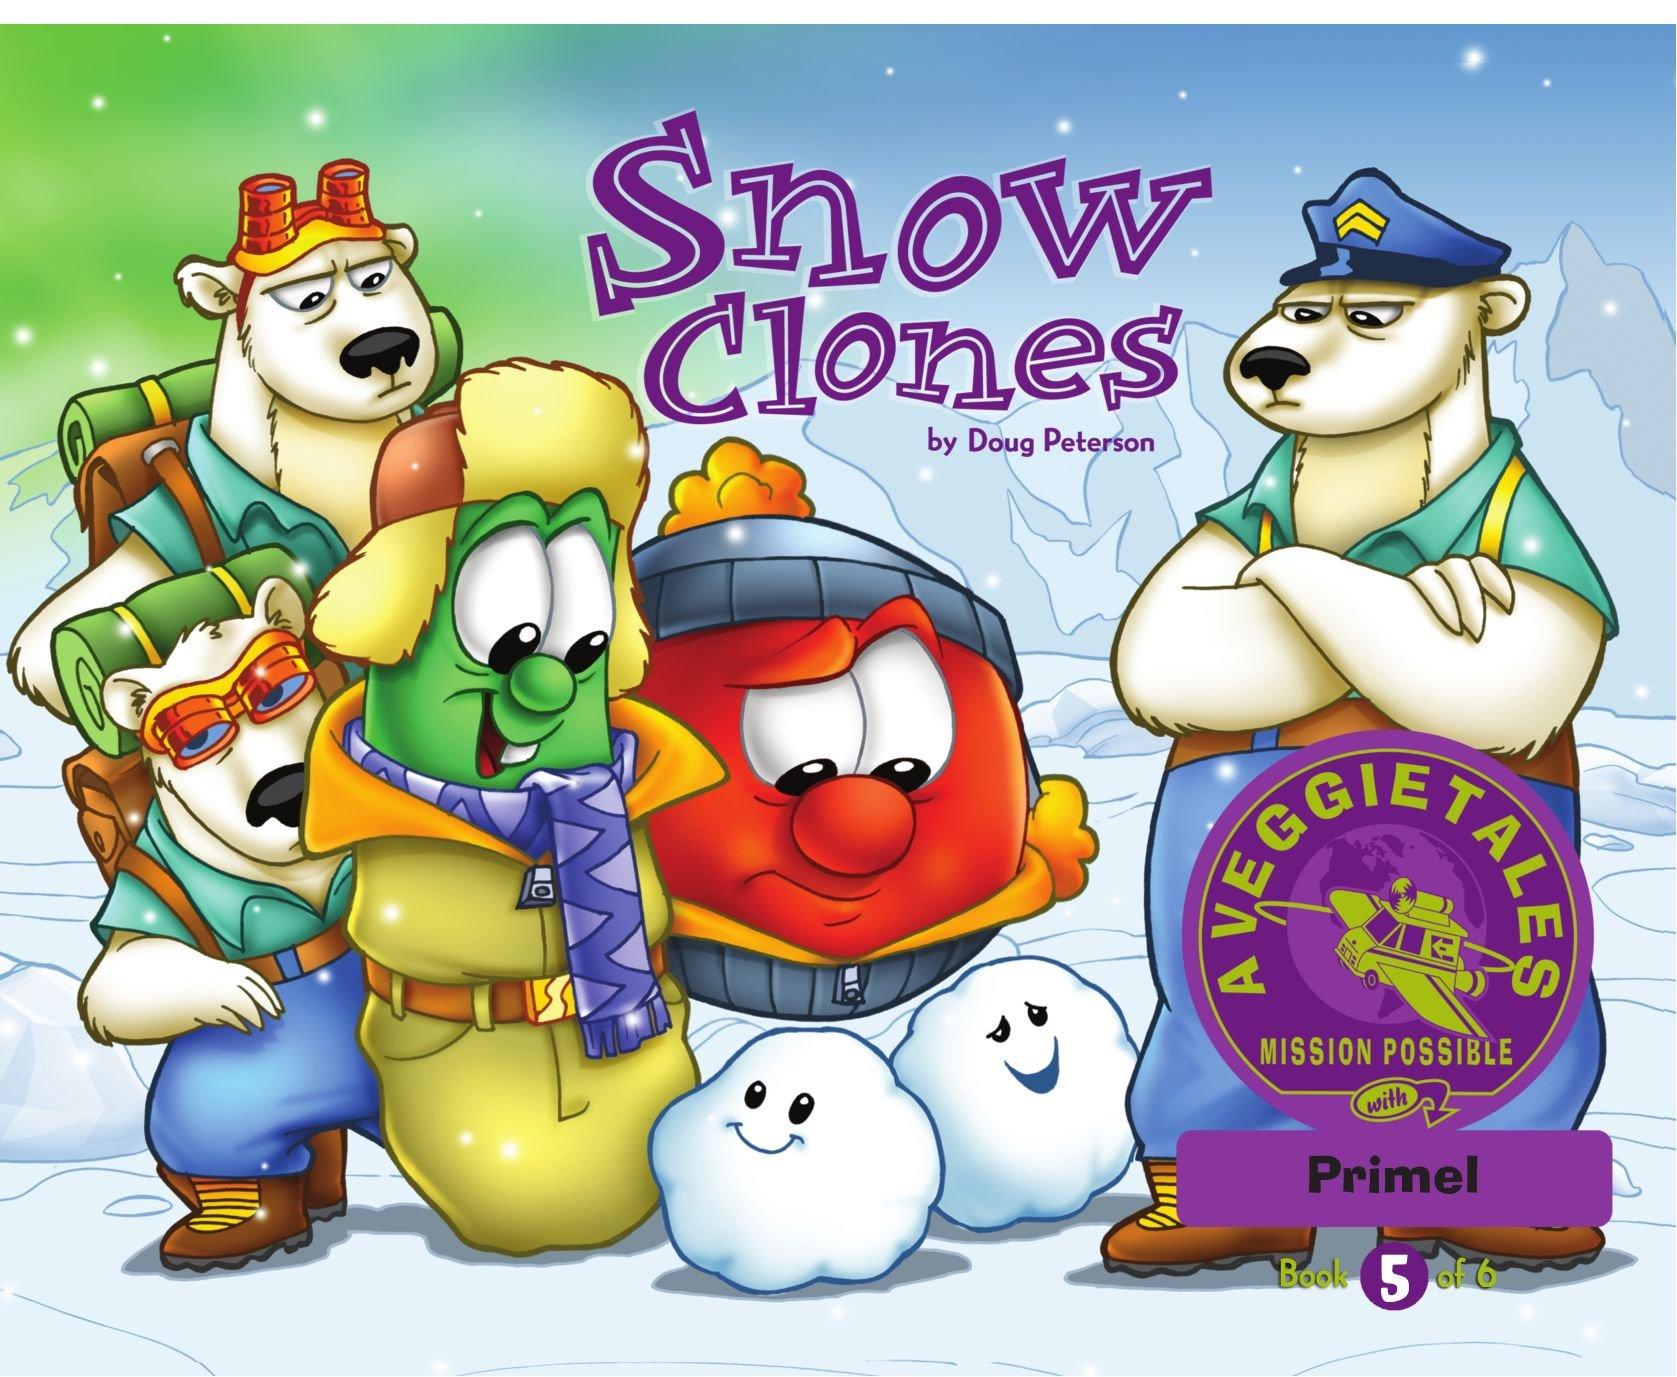 Download Snow Clones - VeggieTales Mission Possible Adventure Series #5: Personalized for Primel (Girl) pdf